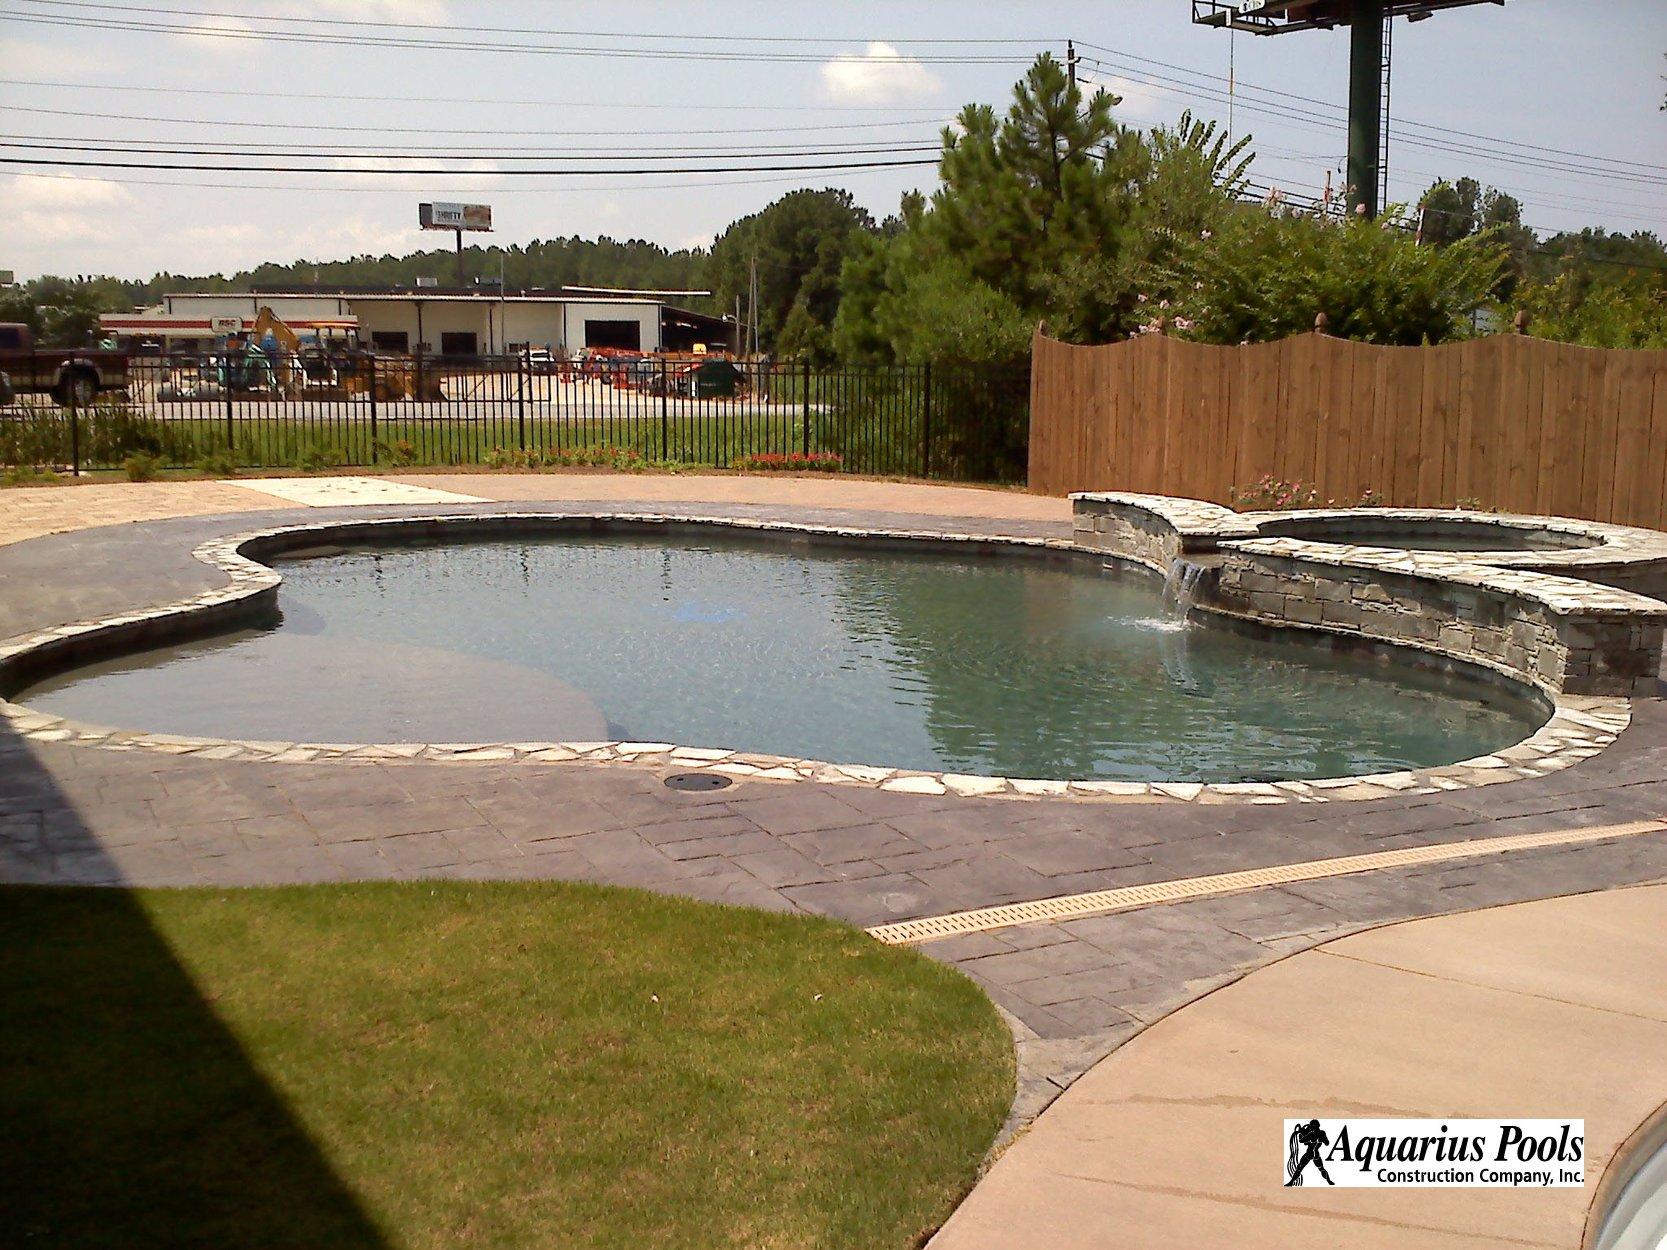 Concrete pool construction columbus georgia for Concrete pool builders